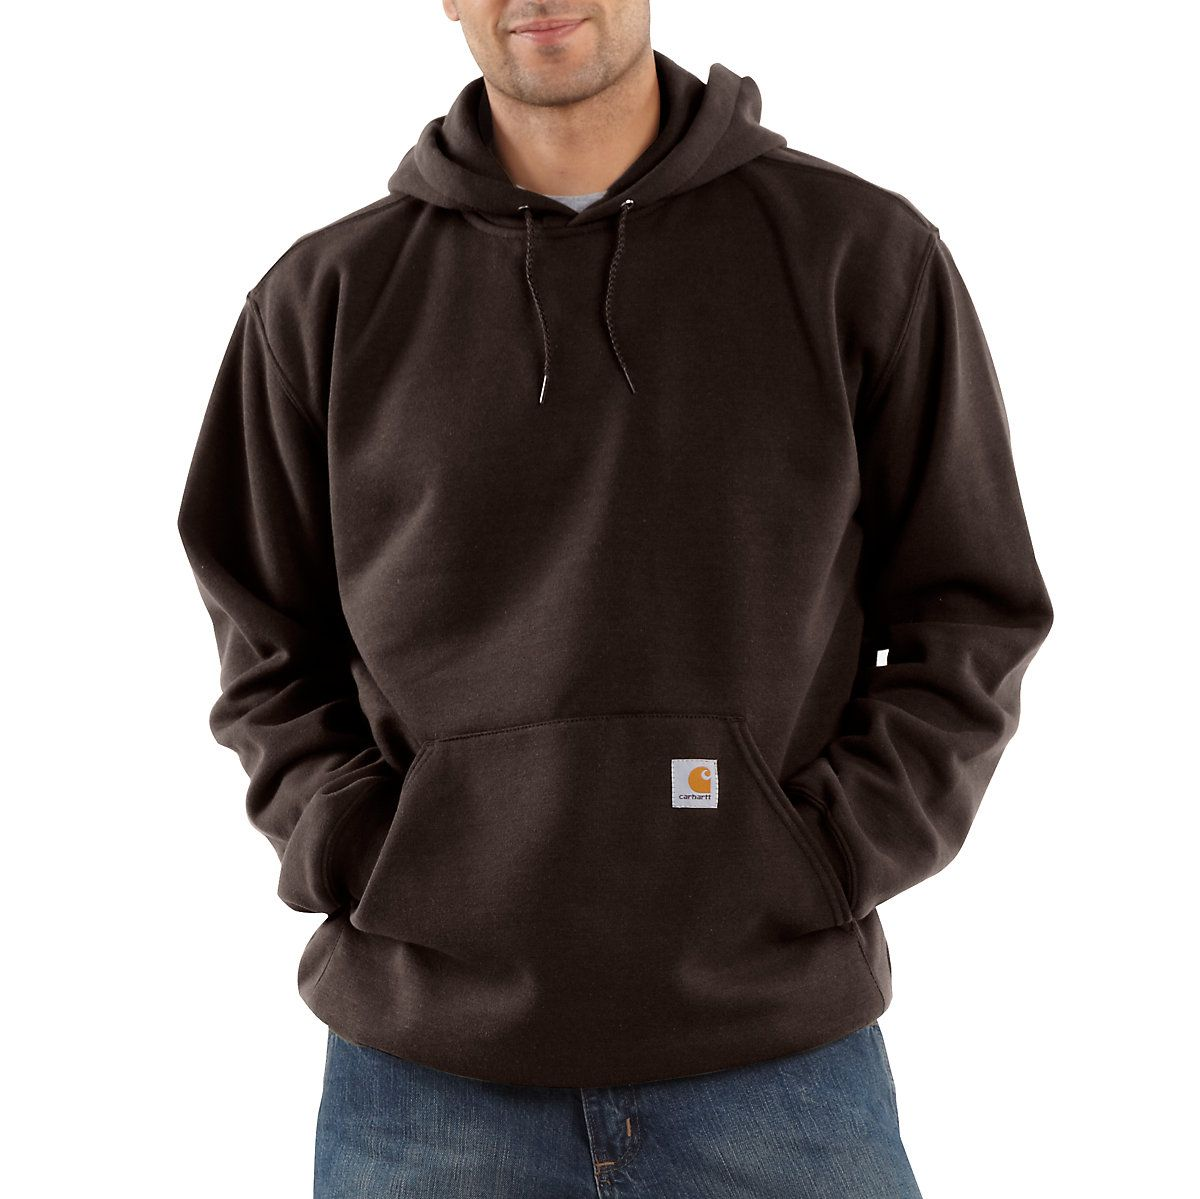 Hooded Pullover Midweight Sweatshirt Carhartt